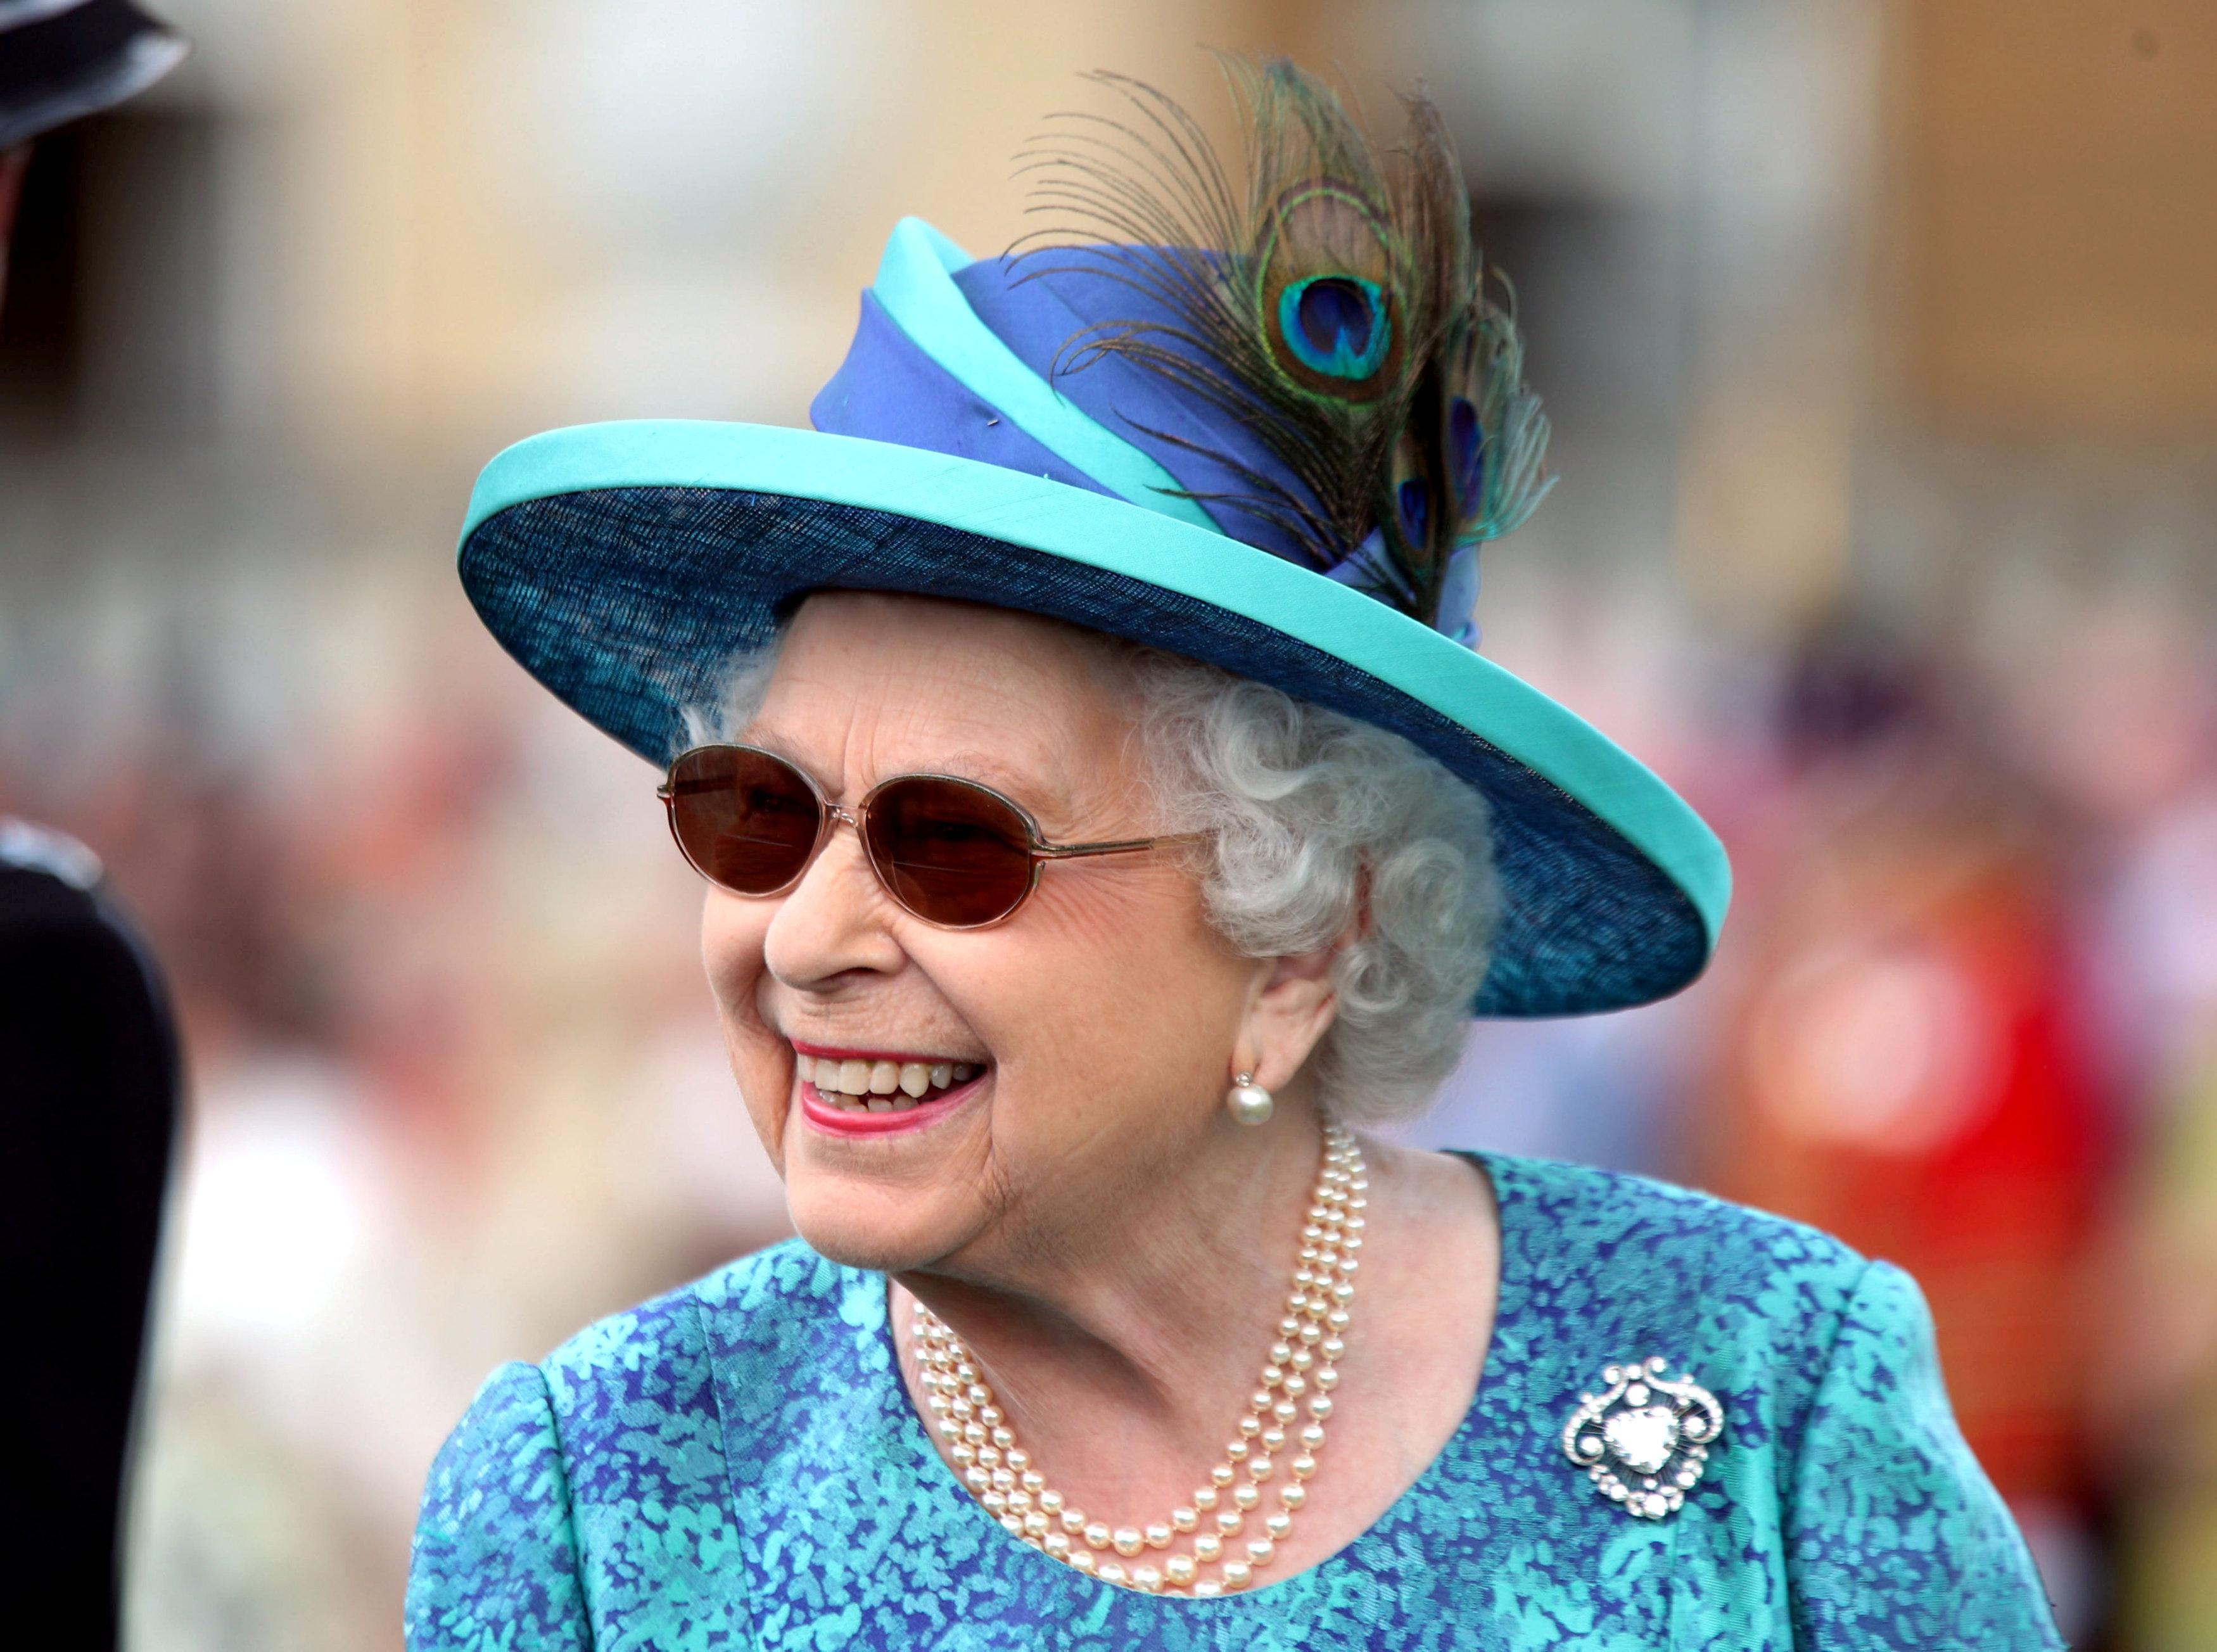 Reina Isabel II cancela acto porque